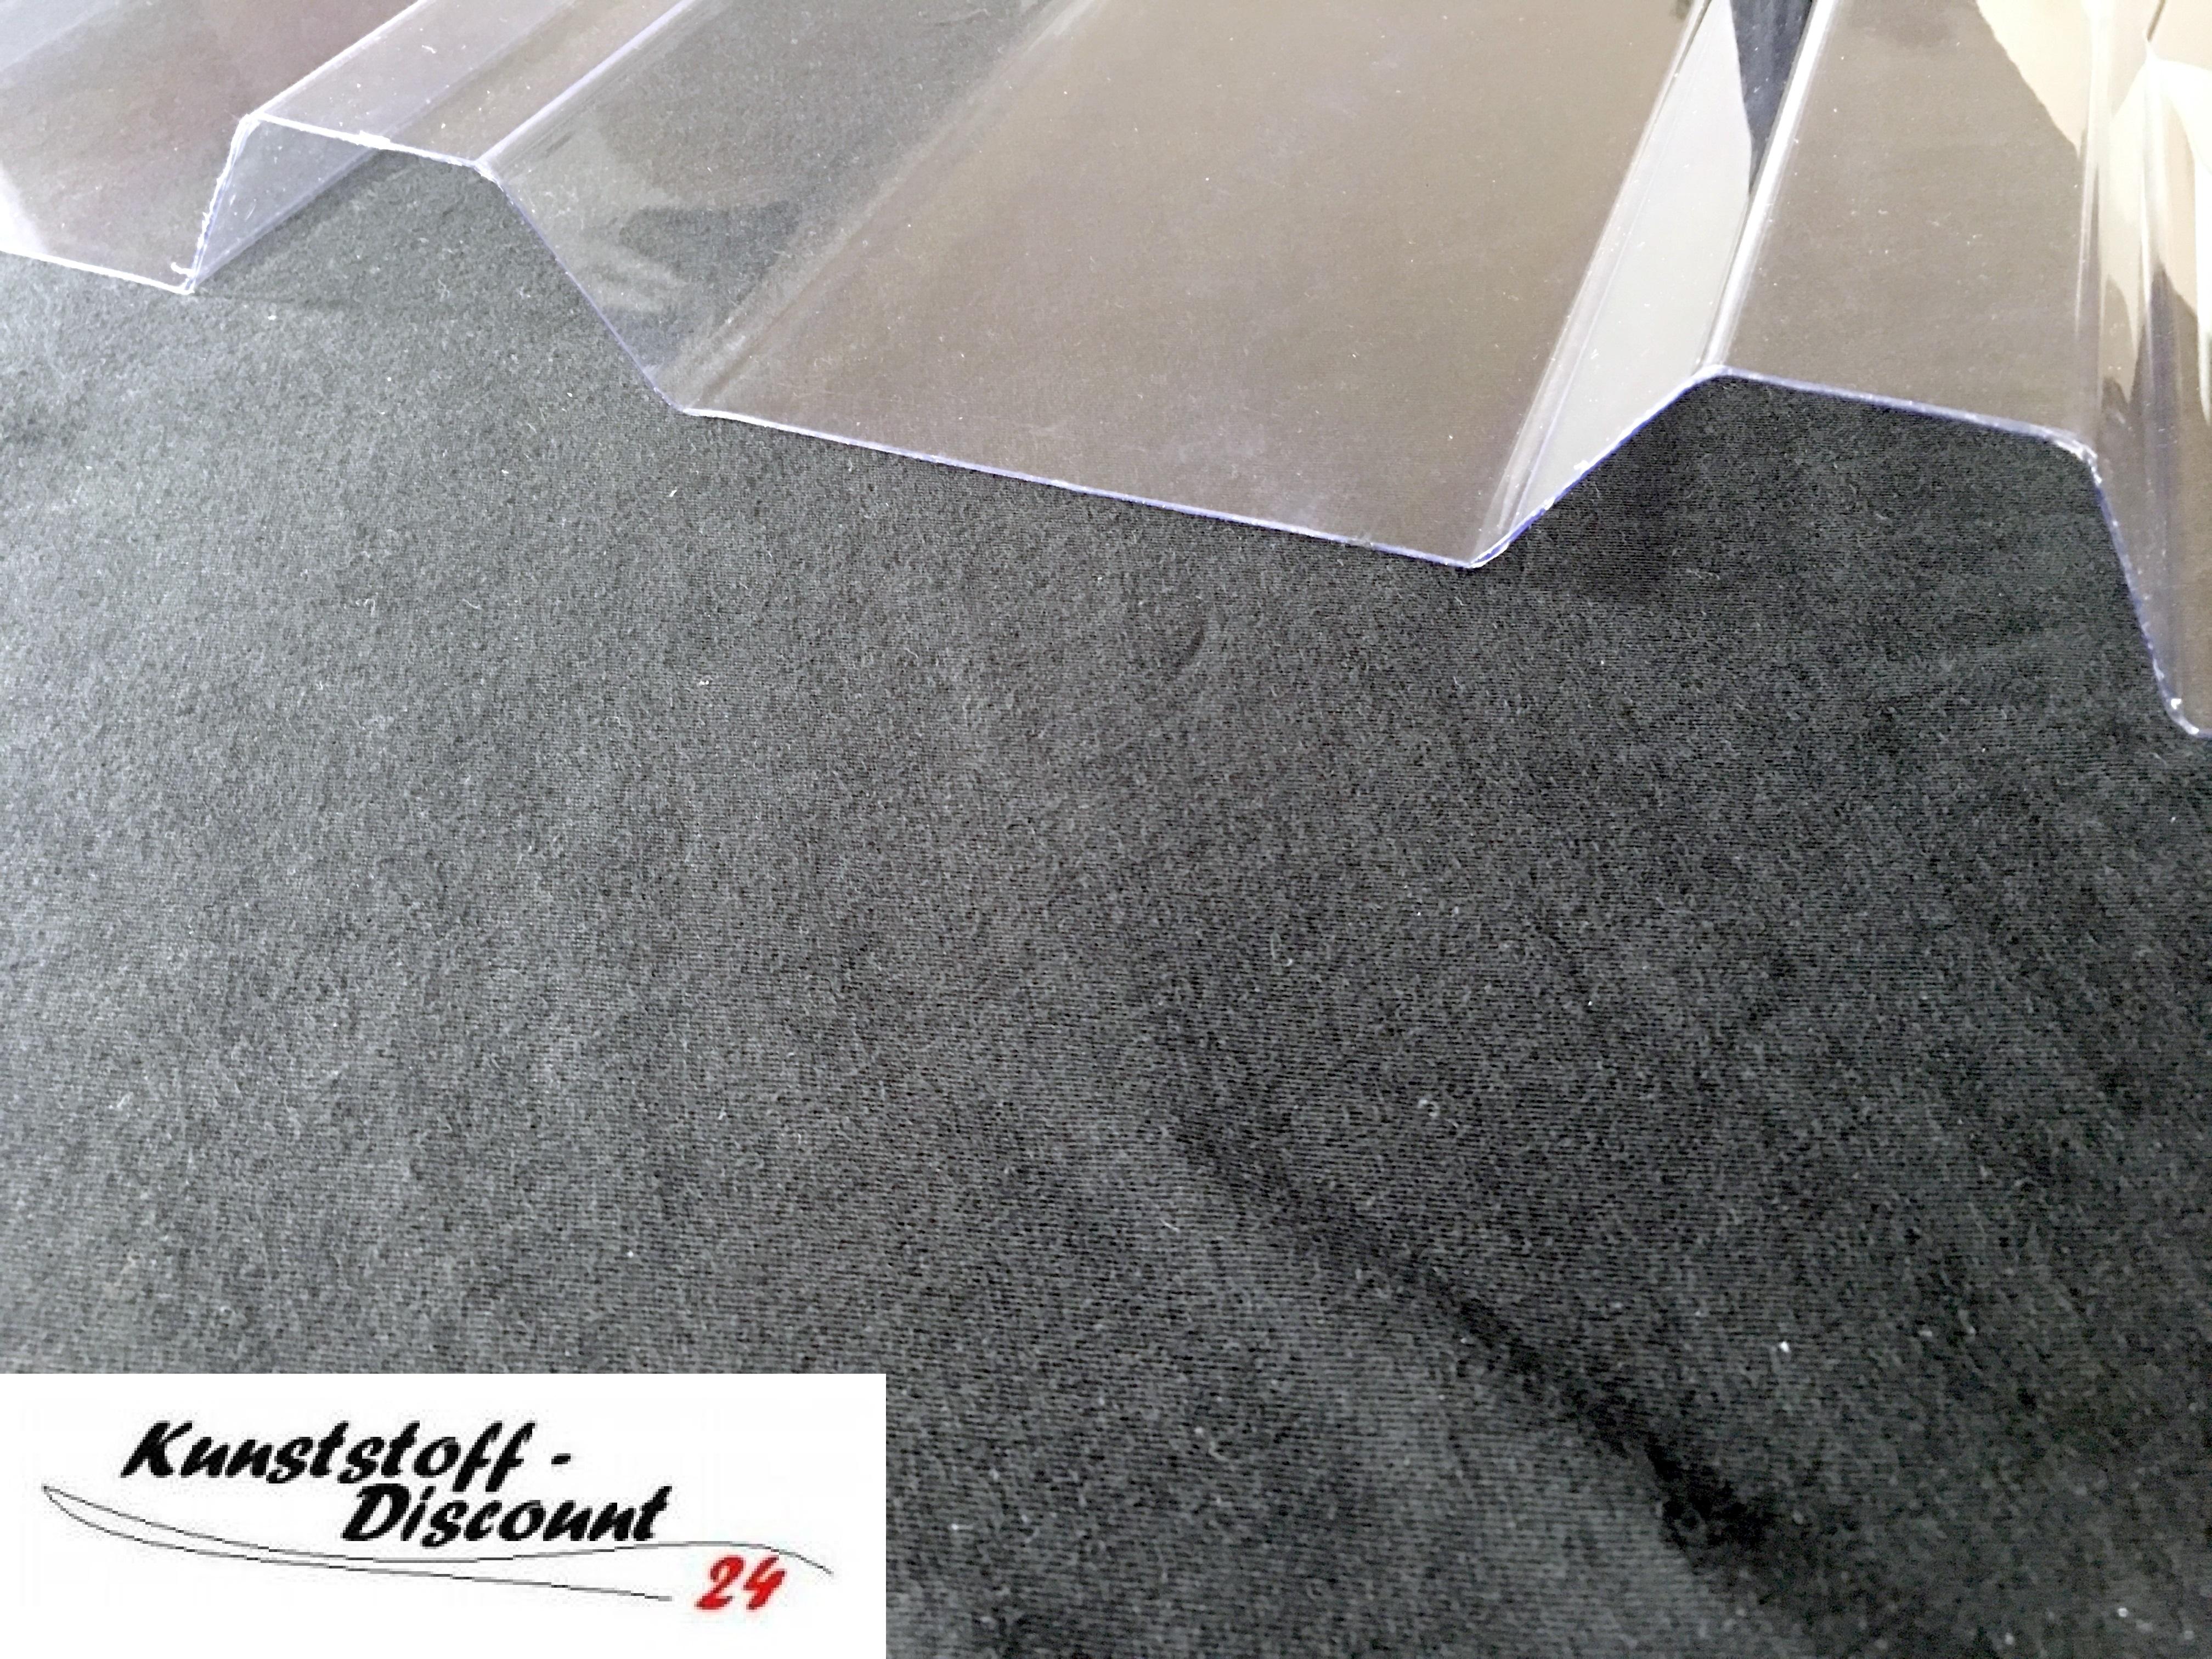 lichtplatte polycarbonat farblos klar 250 48 trapezprofil kunststoffdiscount. Black Bedroom Furniture Sets. Home Design Ideas